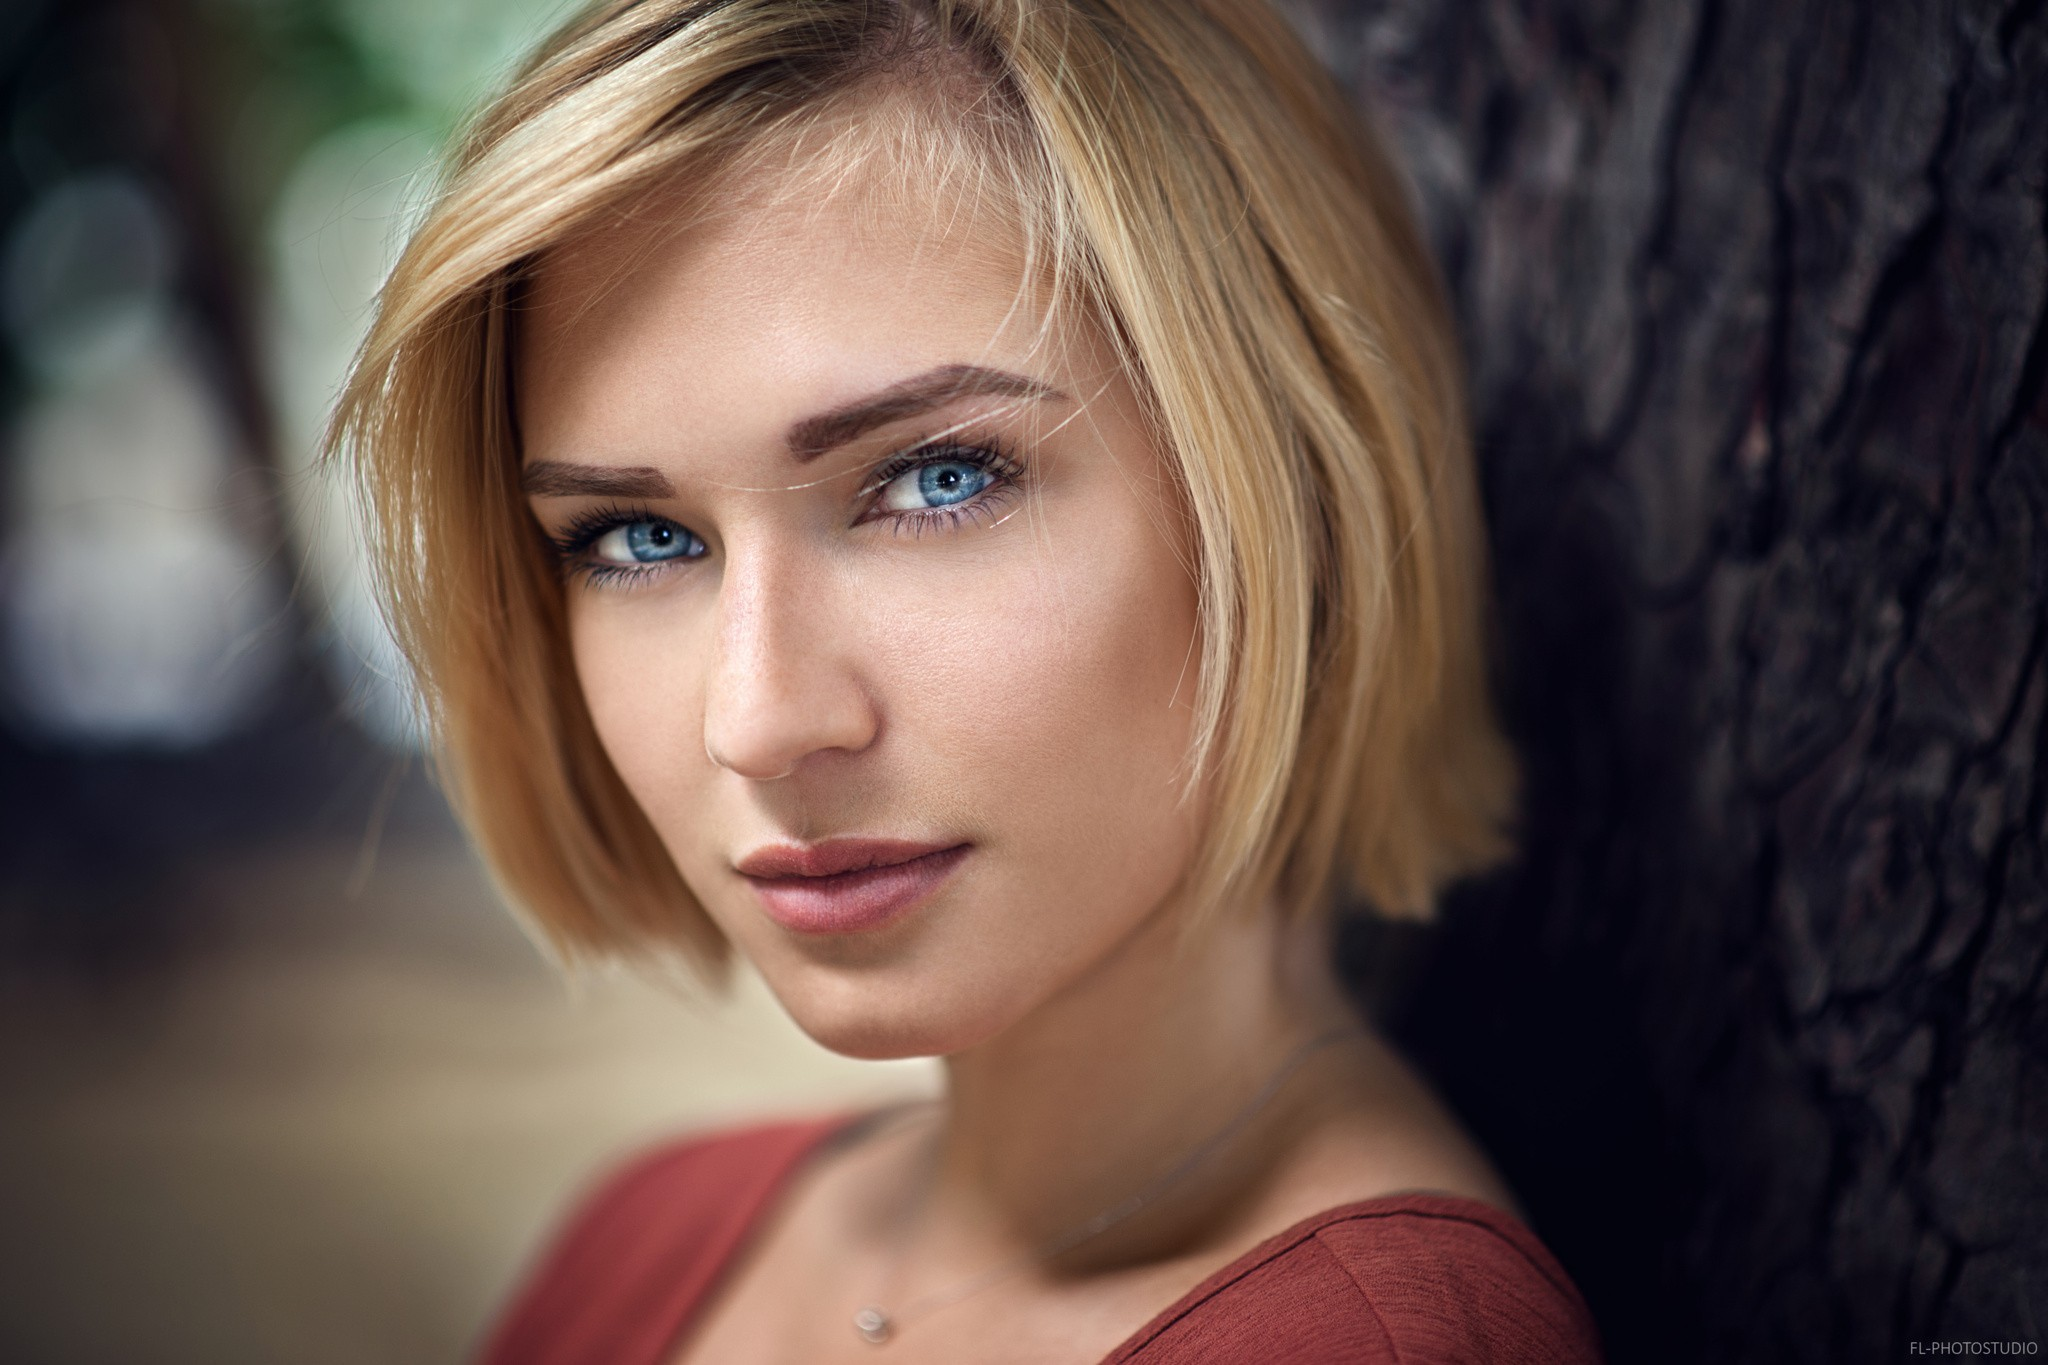 Eva Mikulski